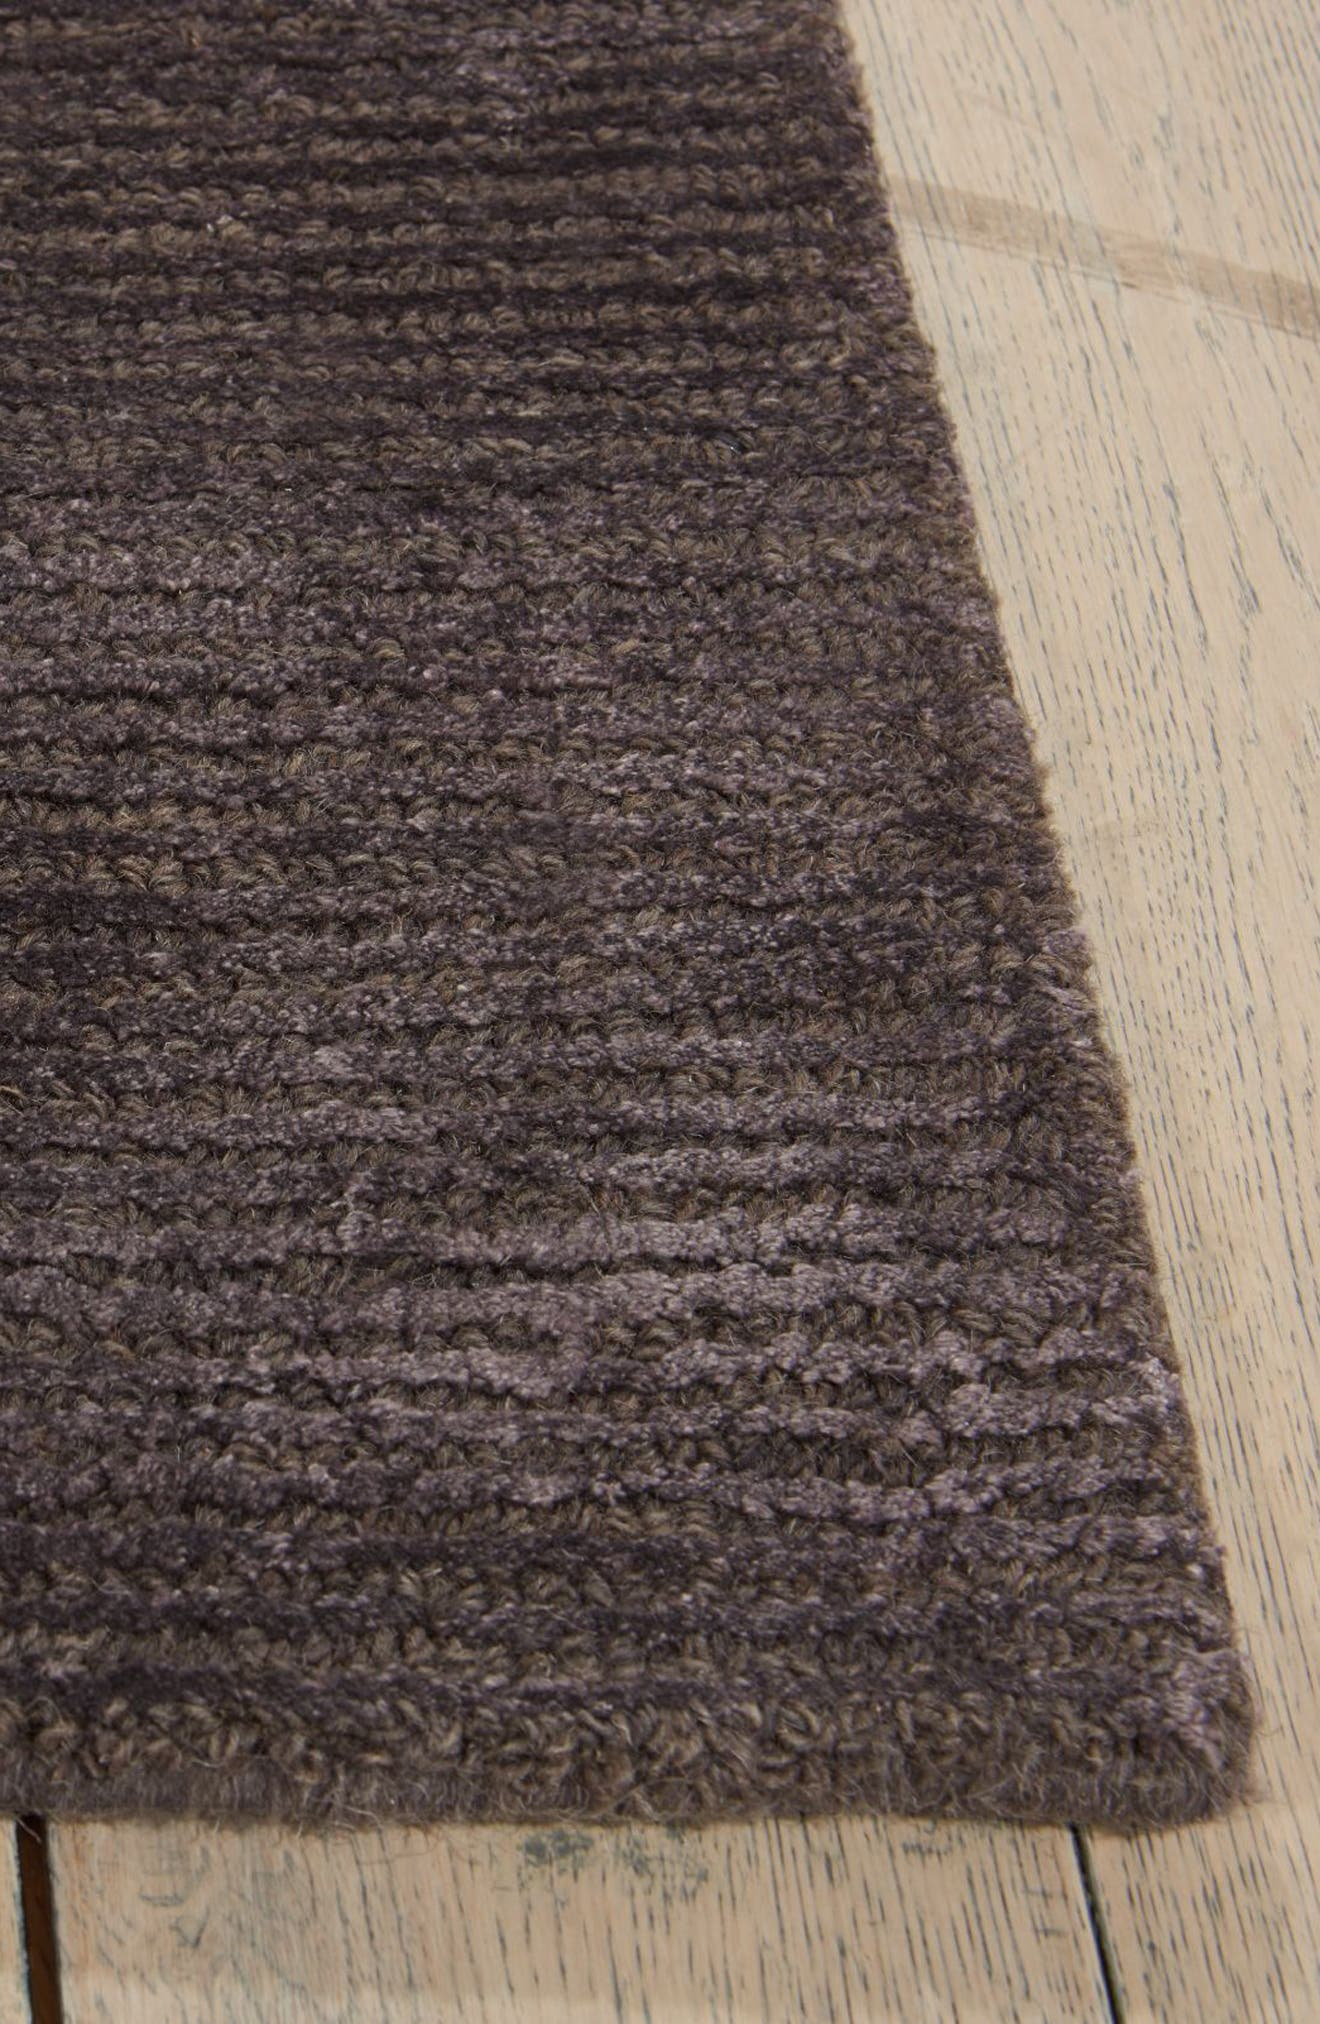 Ravine Furrow Handwoven Area Rug,                             Alternate thumbnail 2, color,                             001